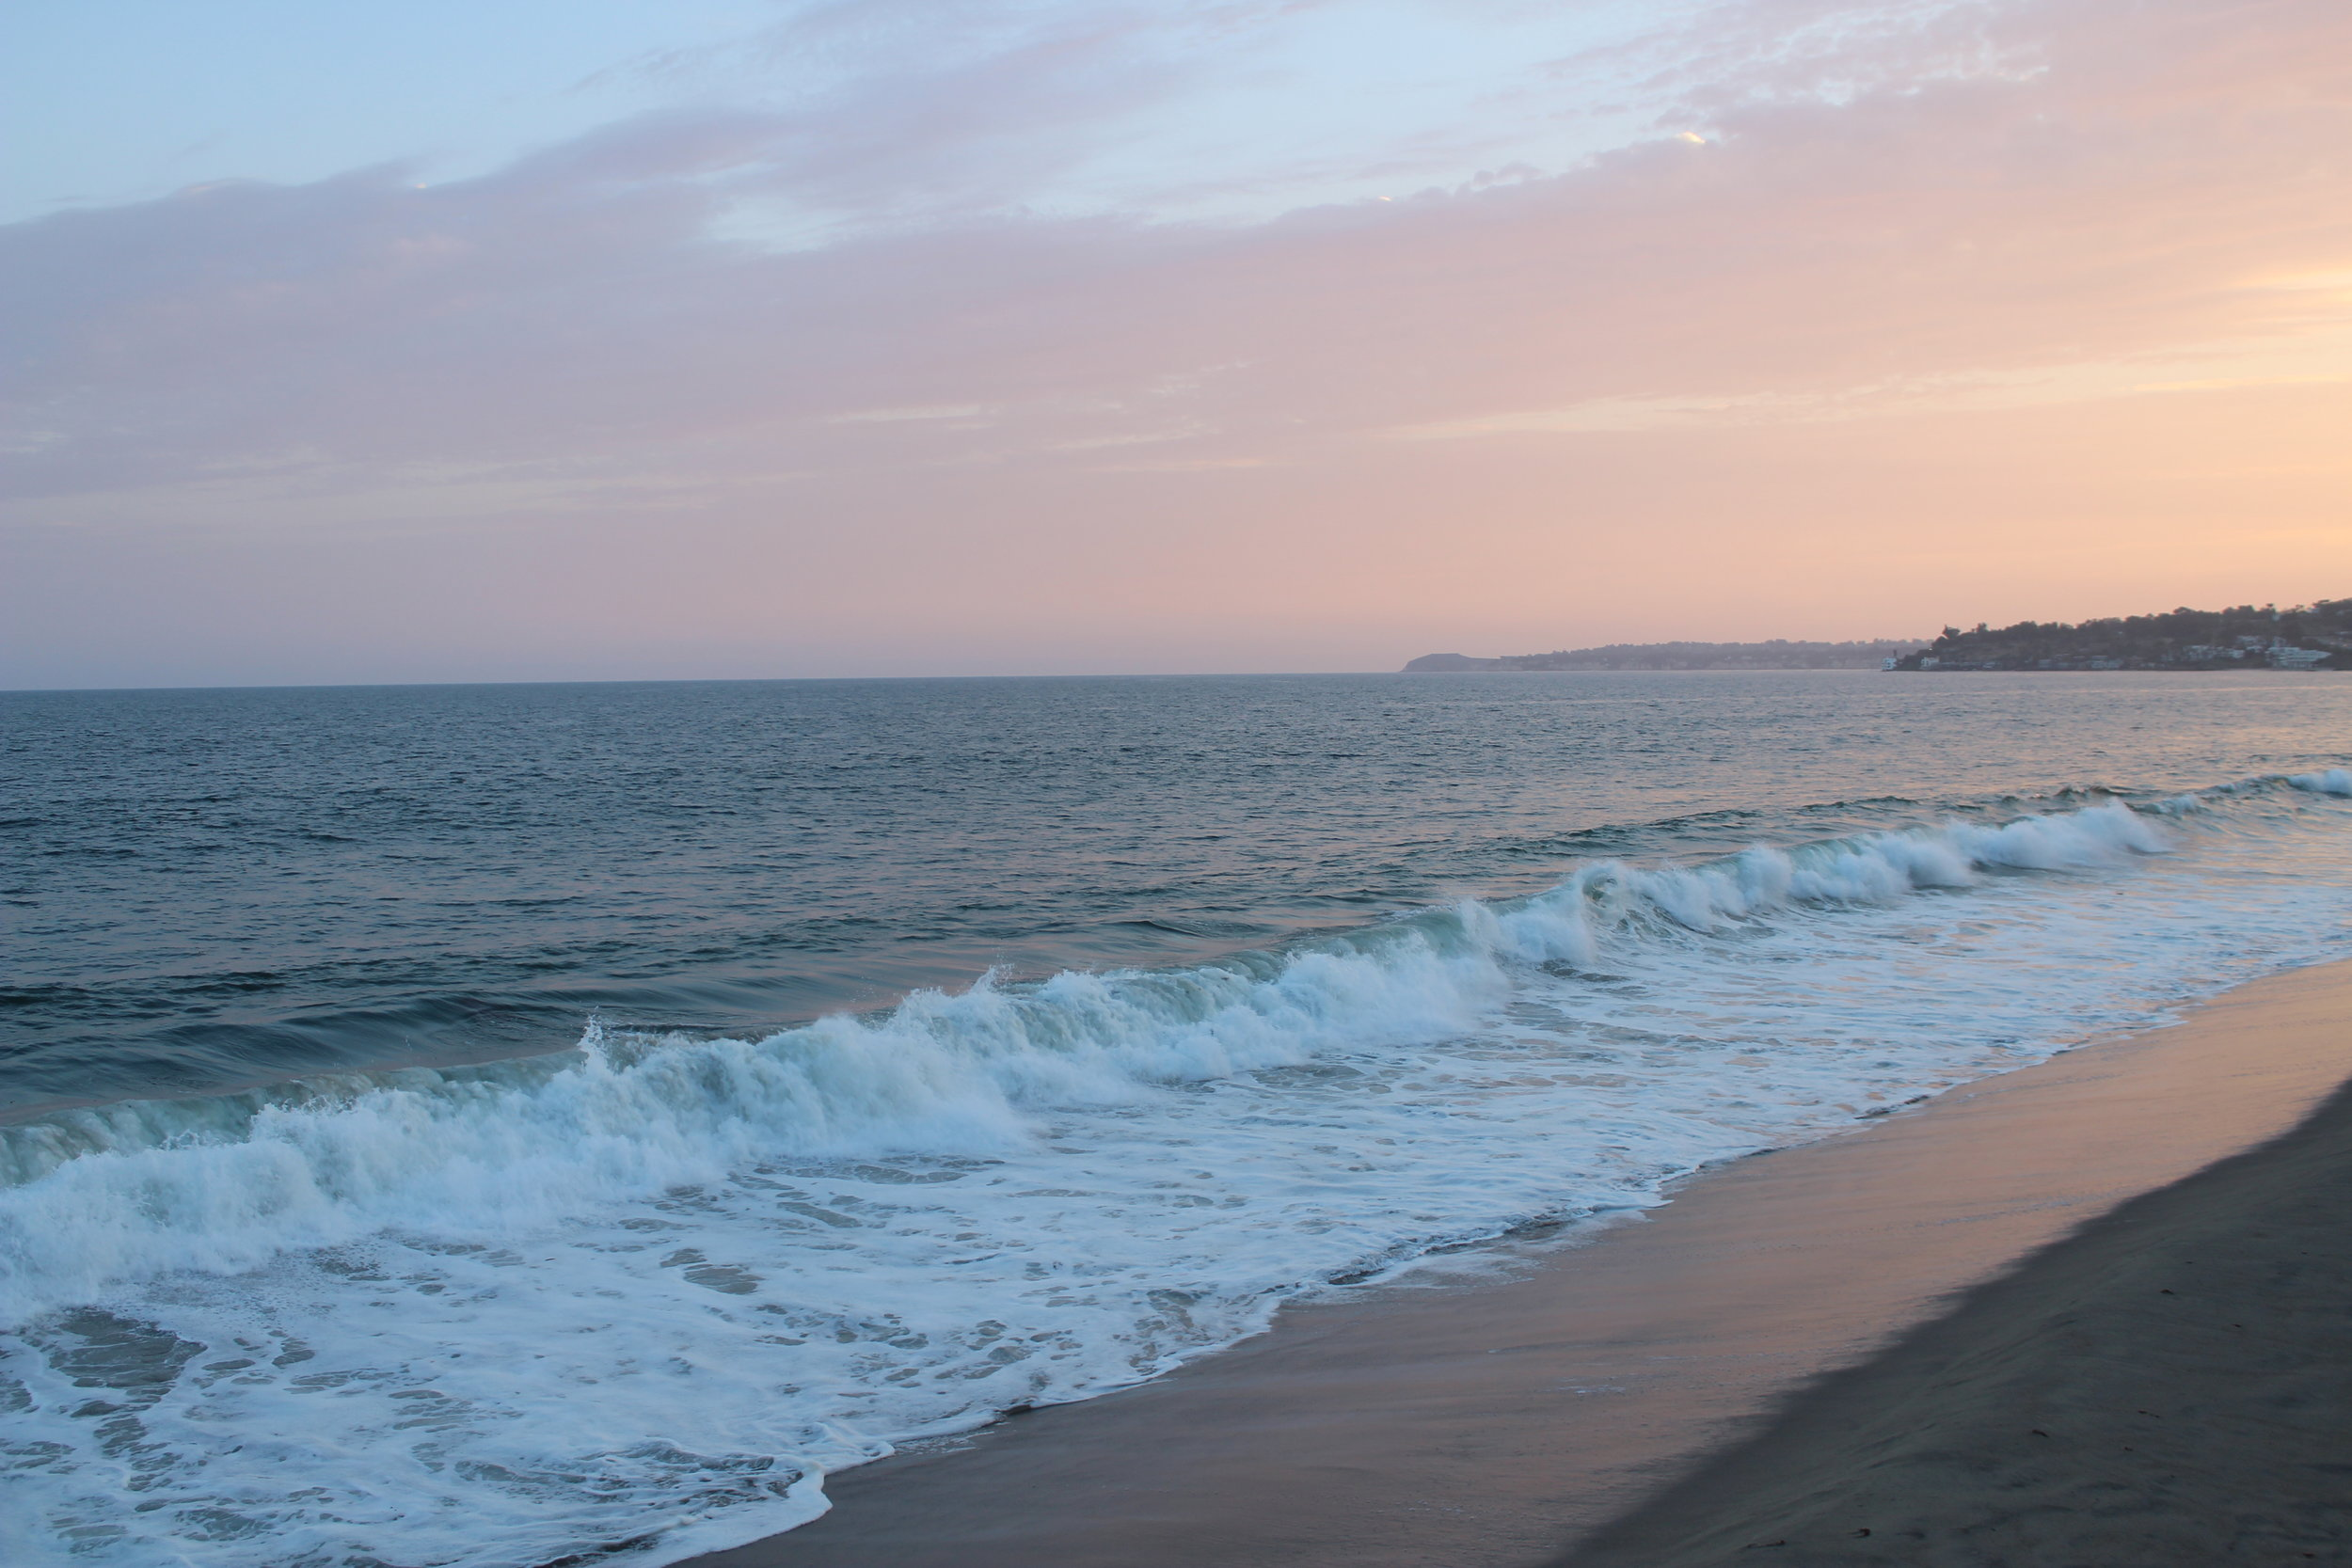 013 Ocean View 25342 Malibu Road For Sale Lease The Malibu Life Team Luxury Real Estate.JPG